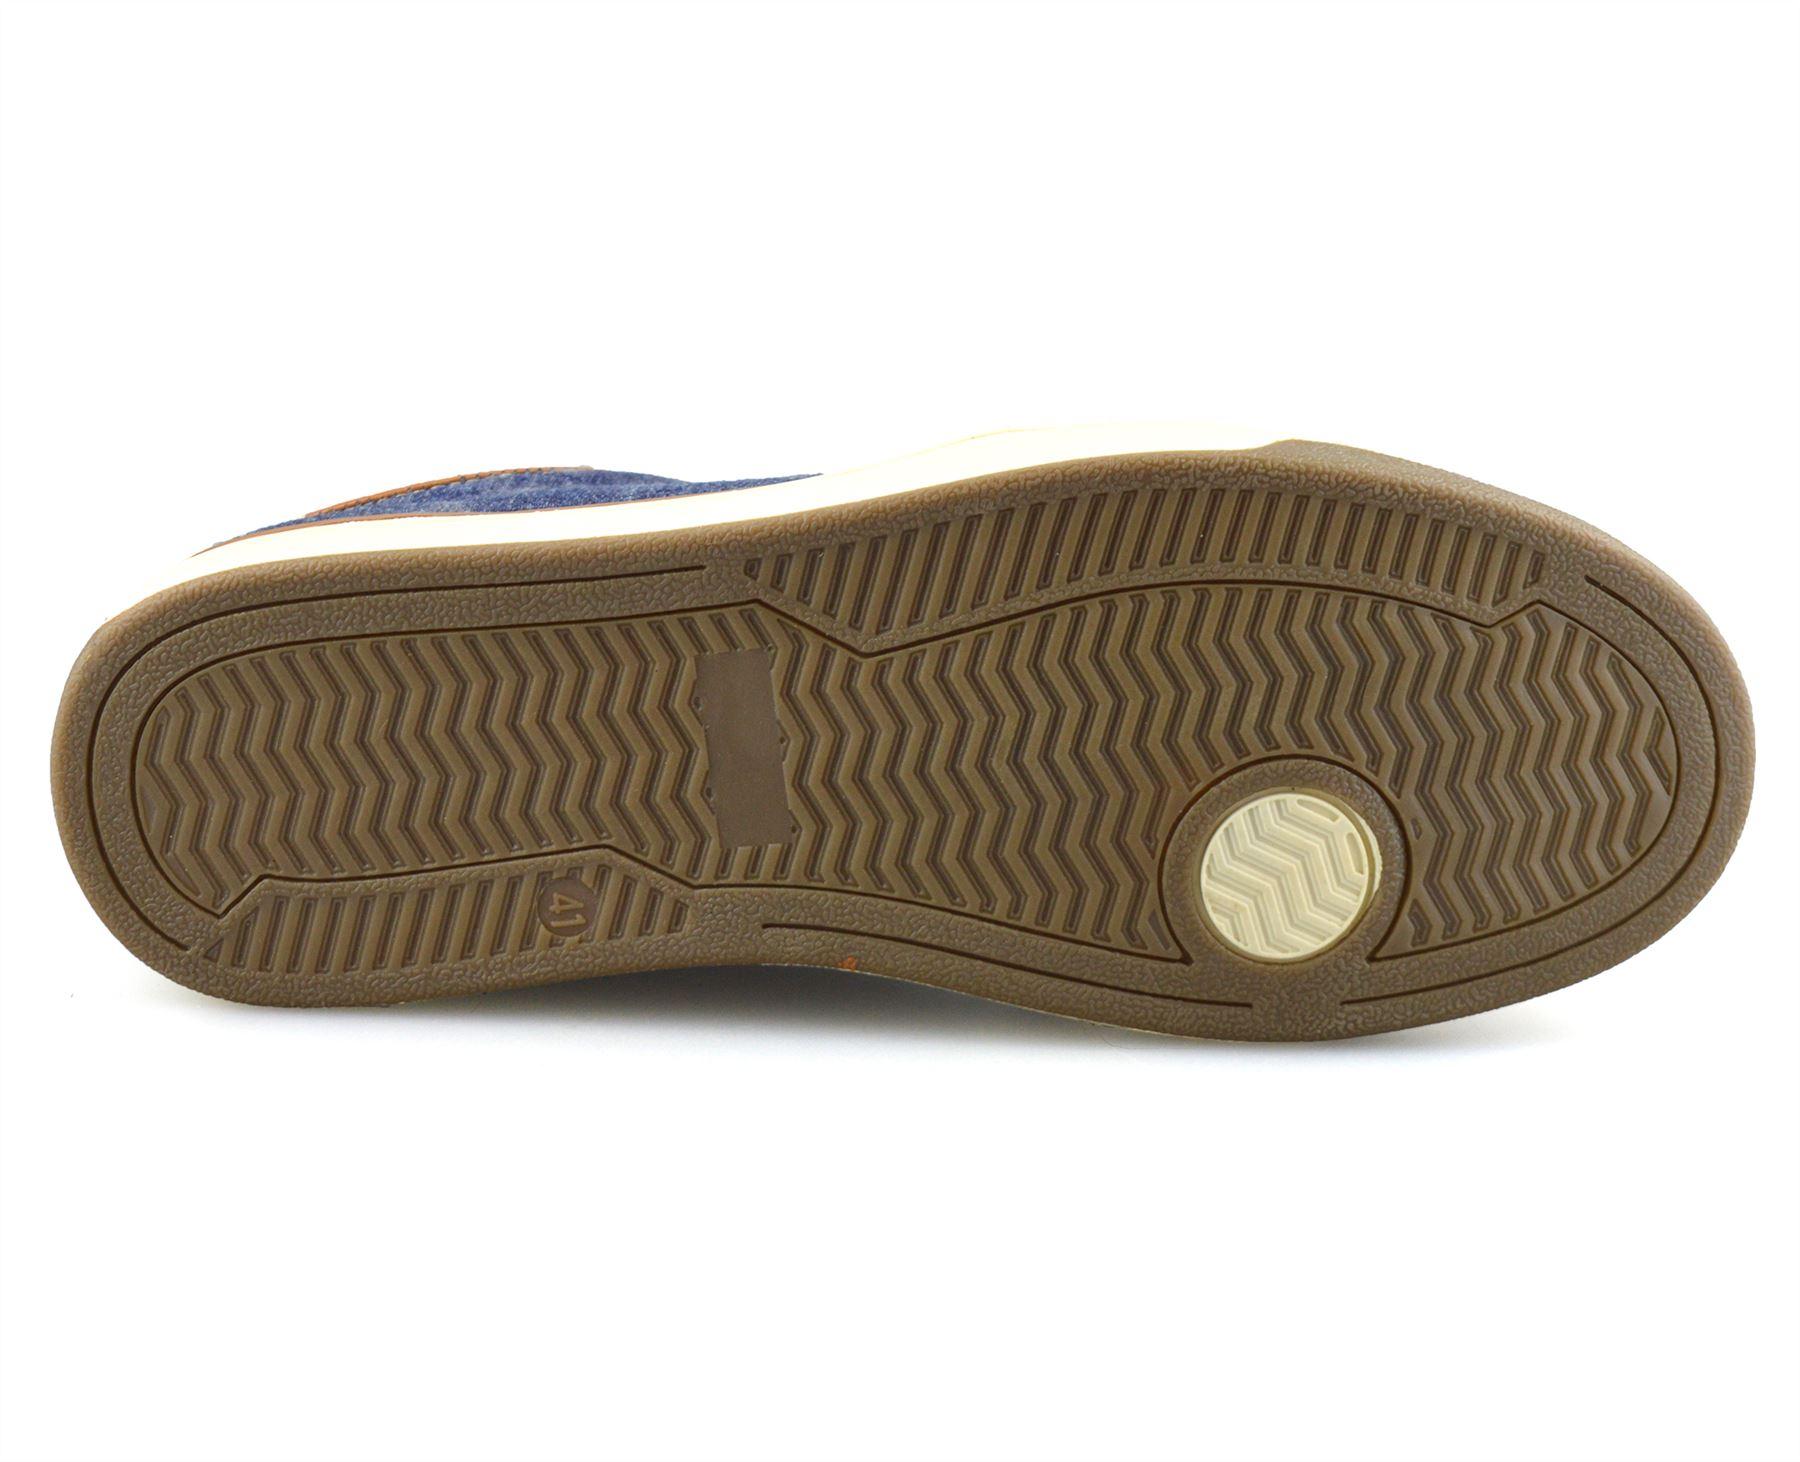 Homme-Nouveau-Casual-Smart-bateau-pont-Mocassin-Walking-Driving-Work-Lace-Up-Chaussures-Taille miniature 21